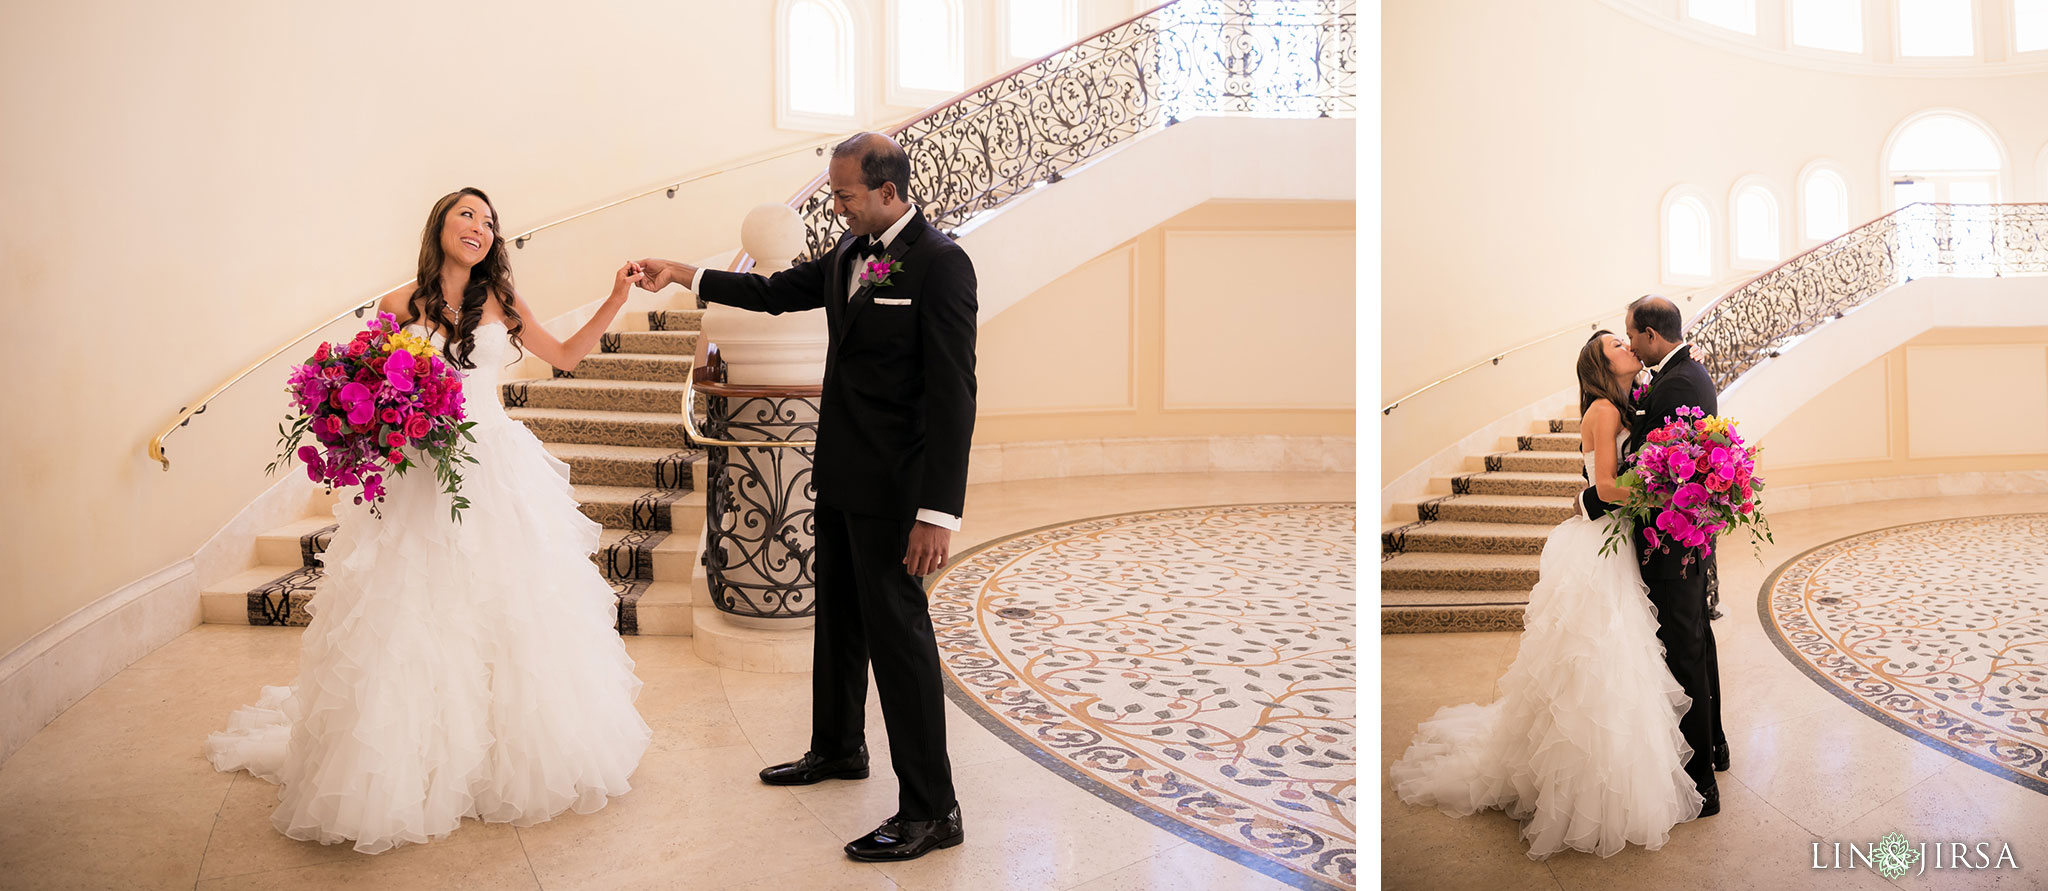 11 monarch beach resort first look wedding photography